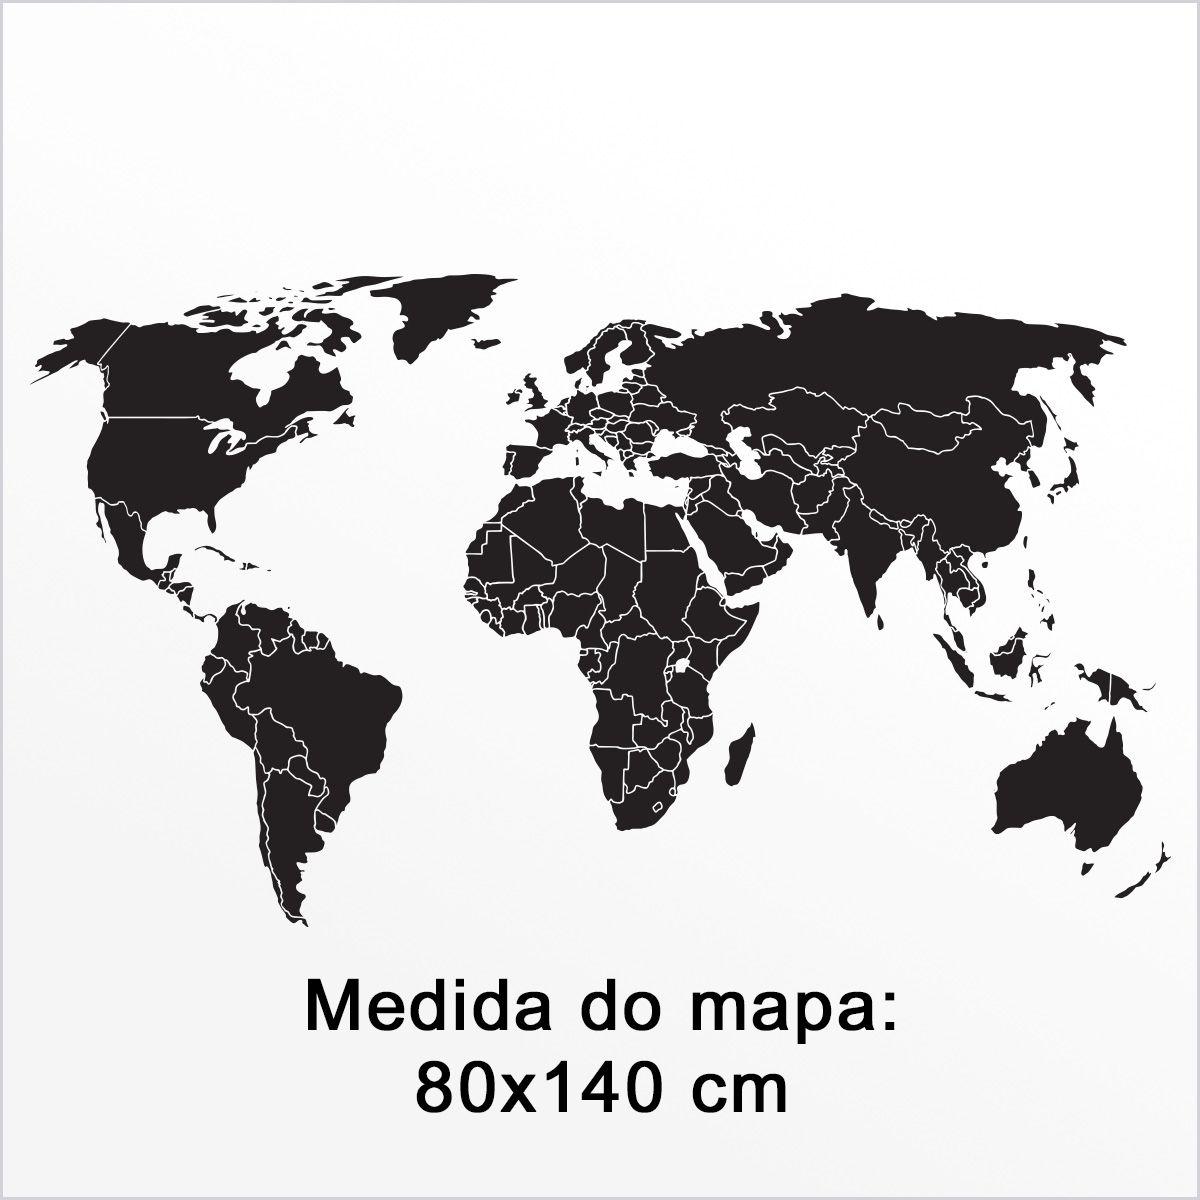 Mapa Mundi Adesivo Molduras Mdf, Mapa Viagens - Frete Grátis (ML)